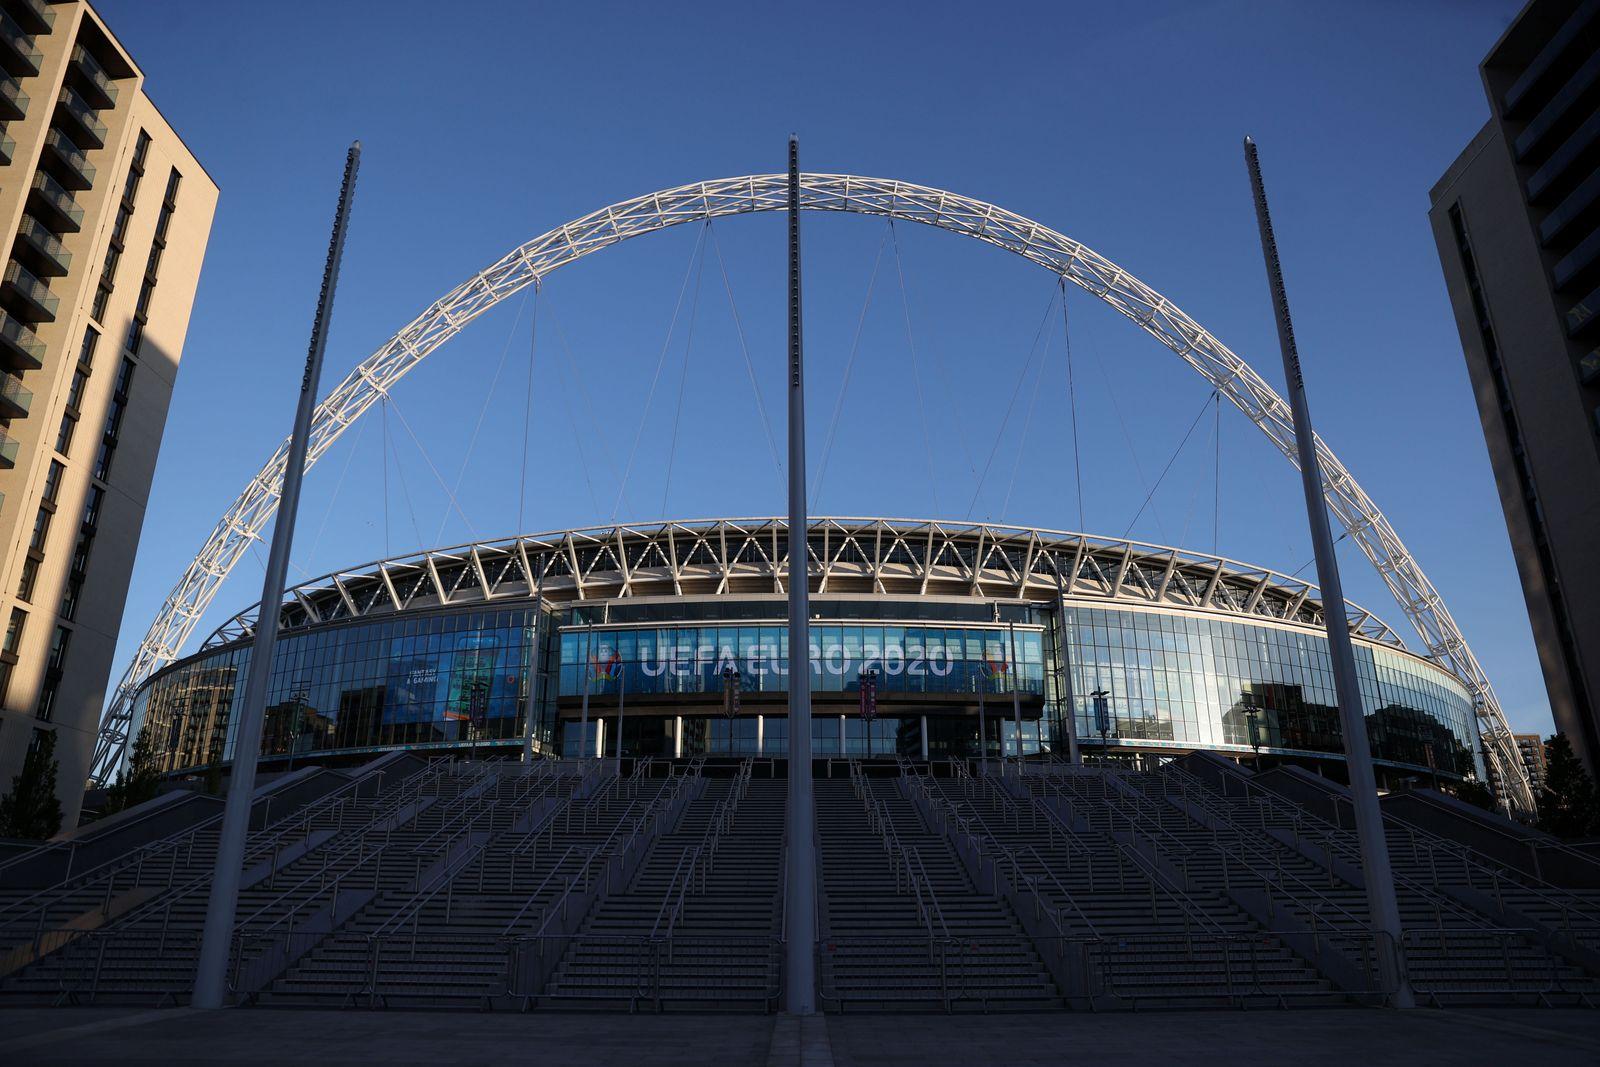 FILE PHOTO: Euro 2020 - General view of Wembley Stadium ahead of the England v Croatia match